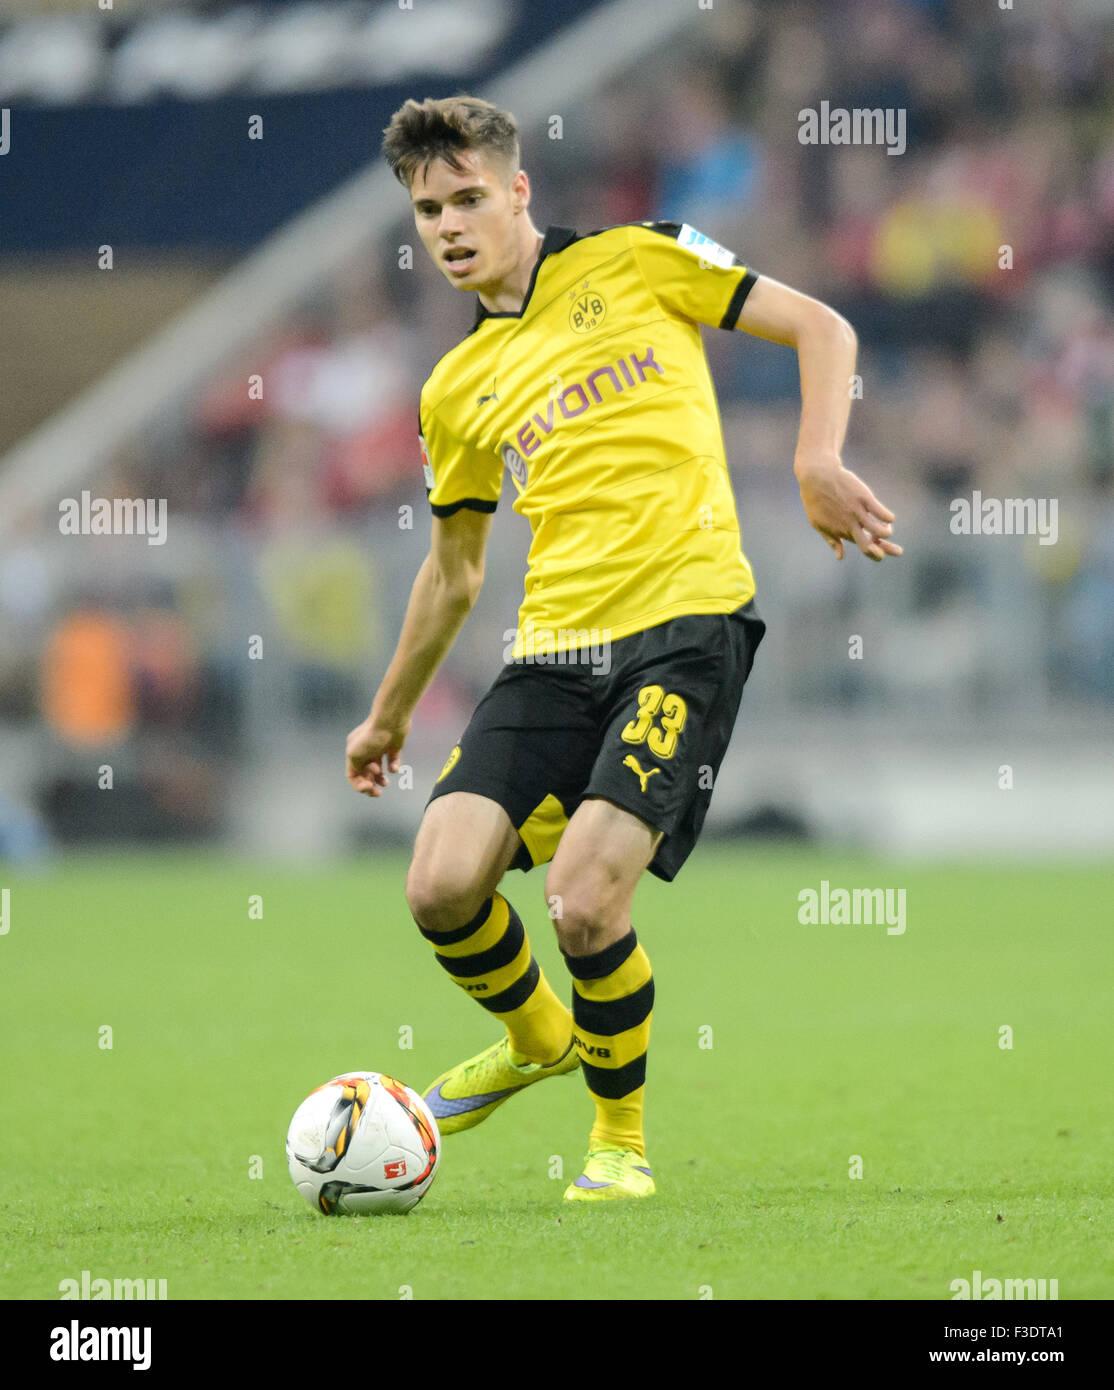 Munich Germany 4th Oct 2015 Dortmunds s Julian Weigl in action